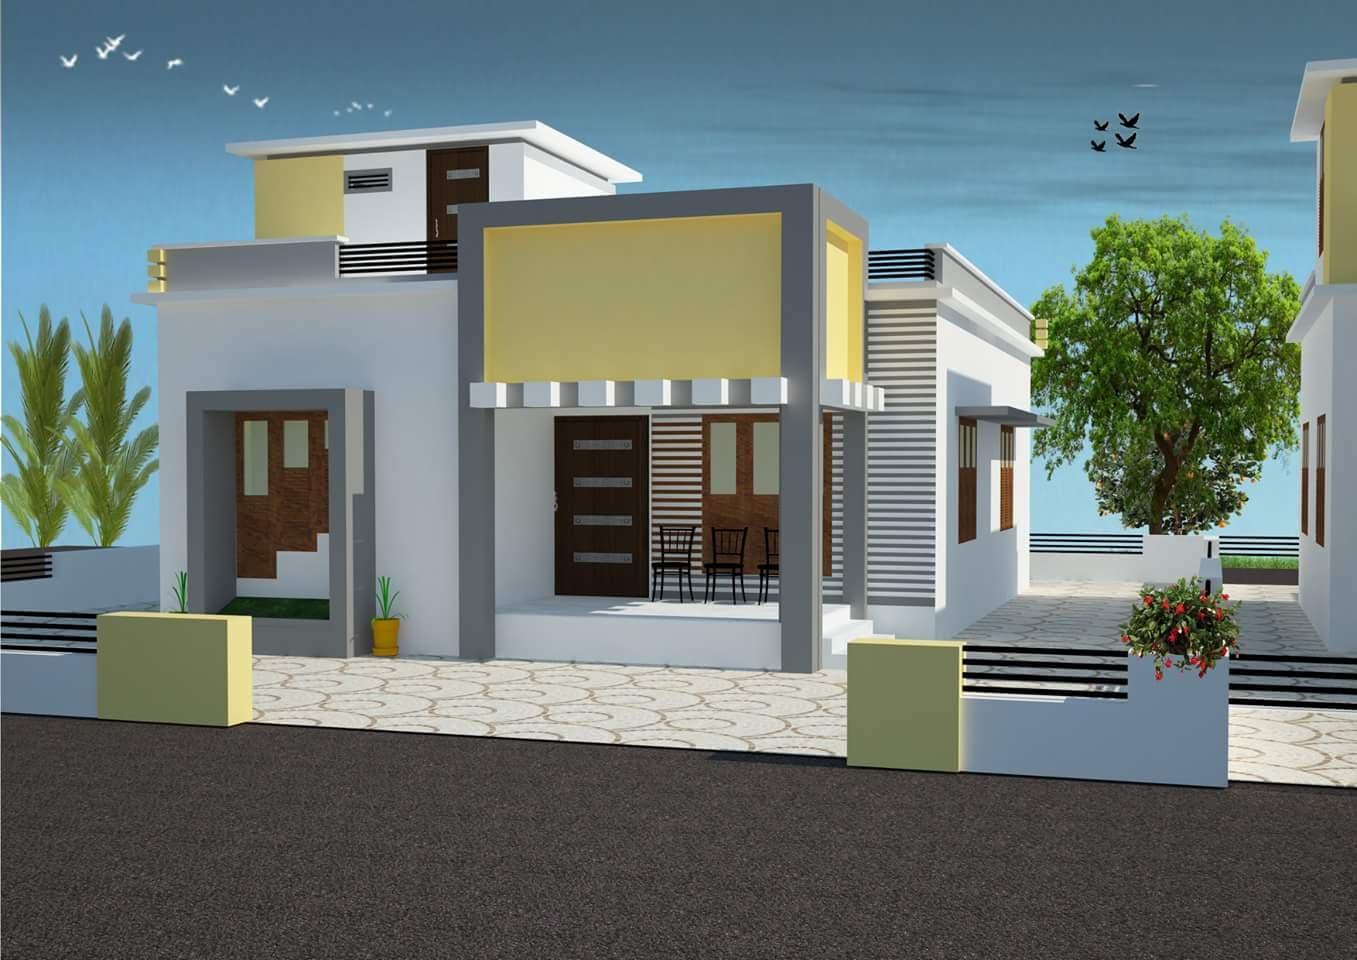 Photo of 800 Square Feet 2 Bedroom Low Budget Single Floor Beautiful Home Design